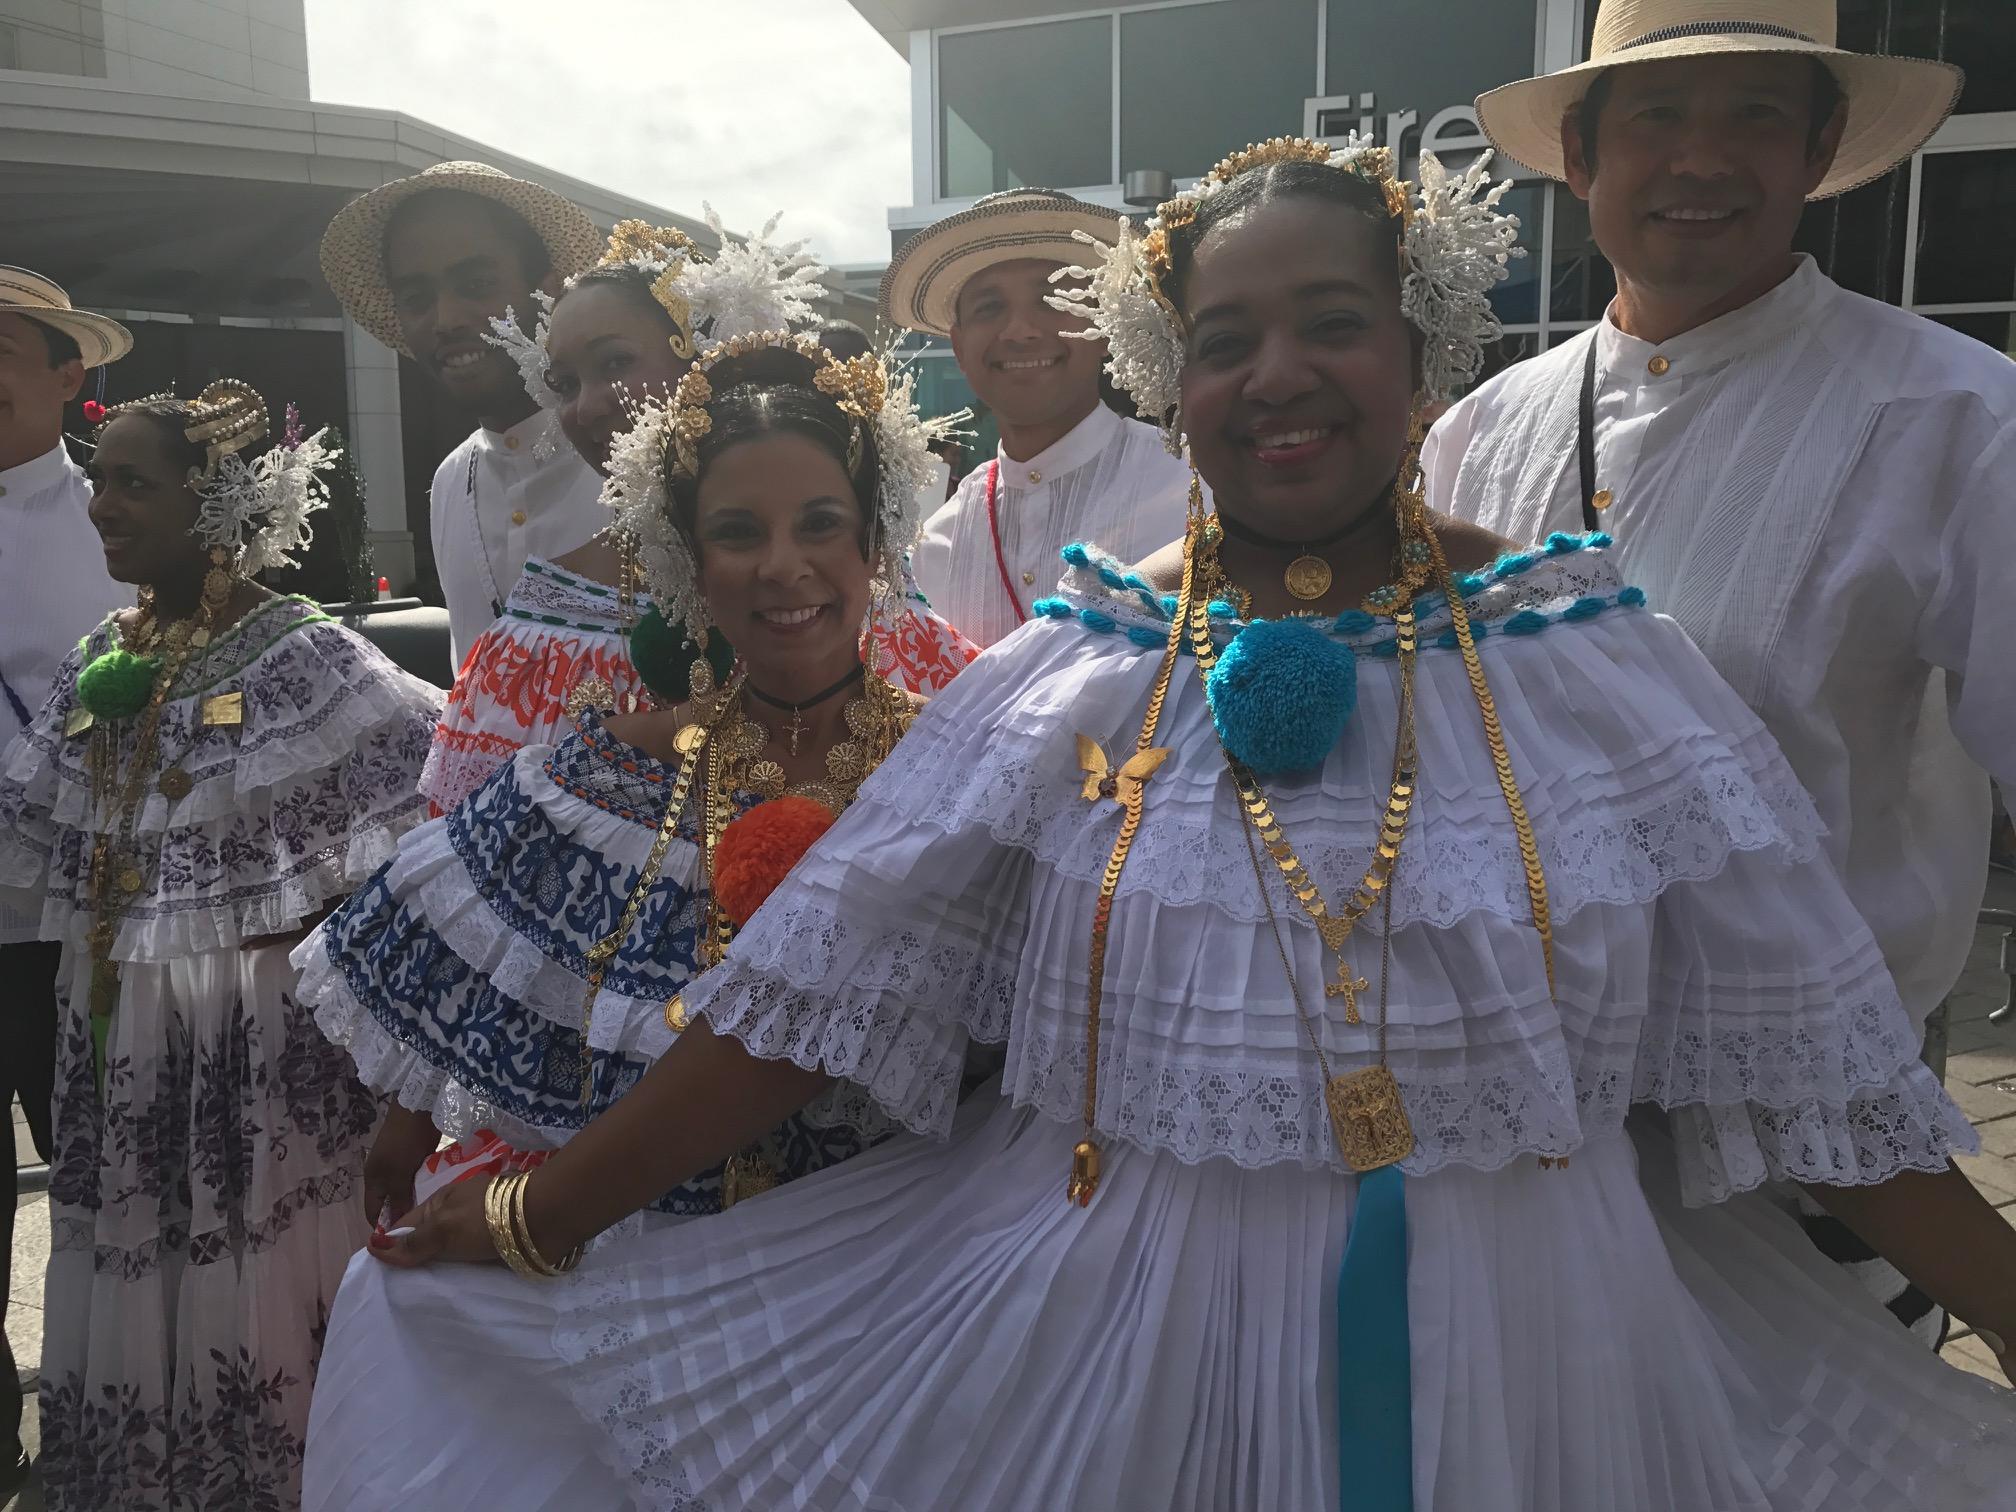 "<div class=""meta image-caption""><div class=""origin-logo origin-image wtvd""><span>WTVD</span></div><span class=""caption-text"">La Fiesta del Pueblo 2017</span></div>"